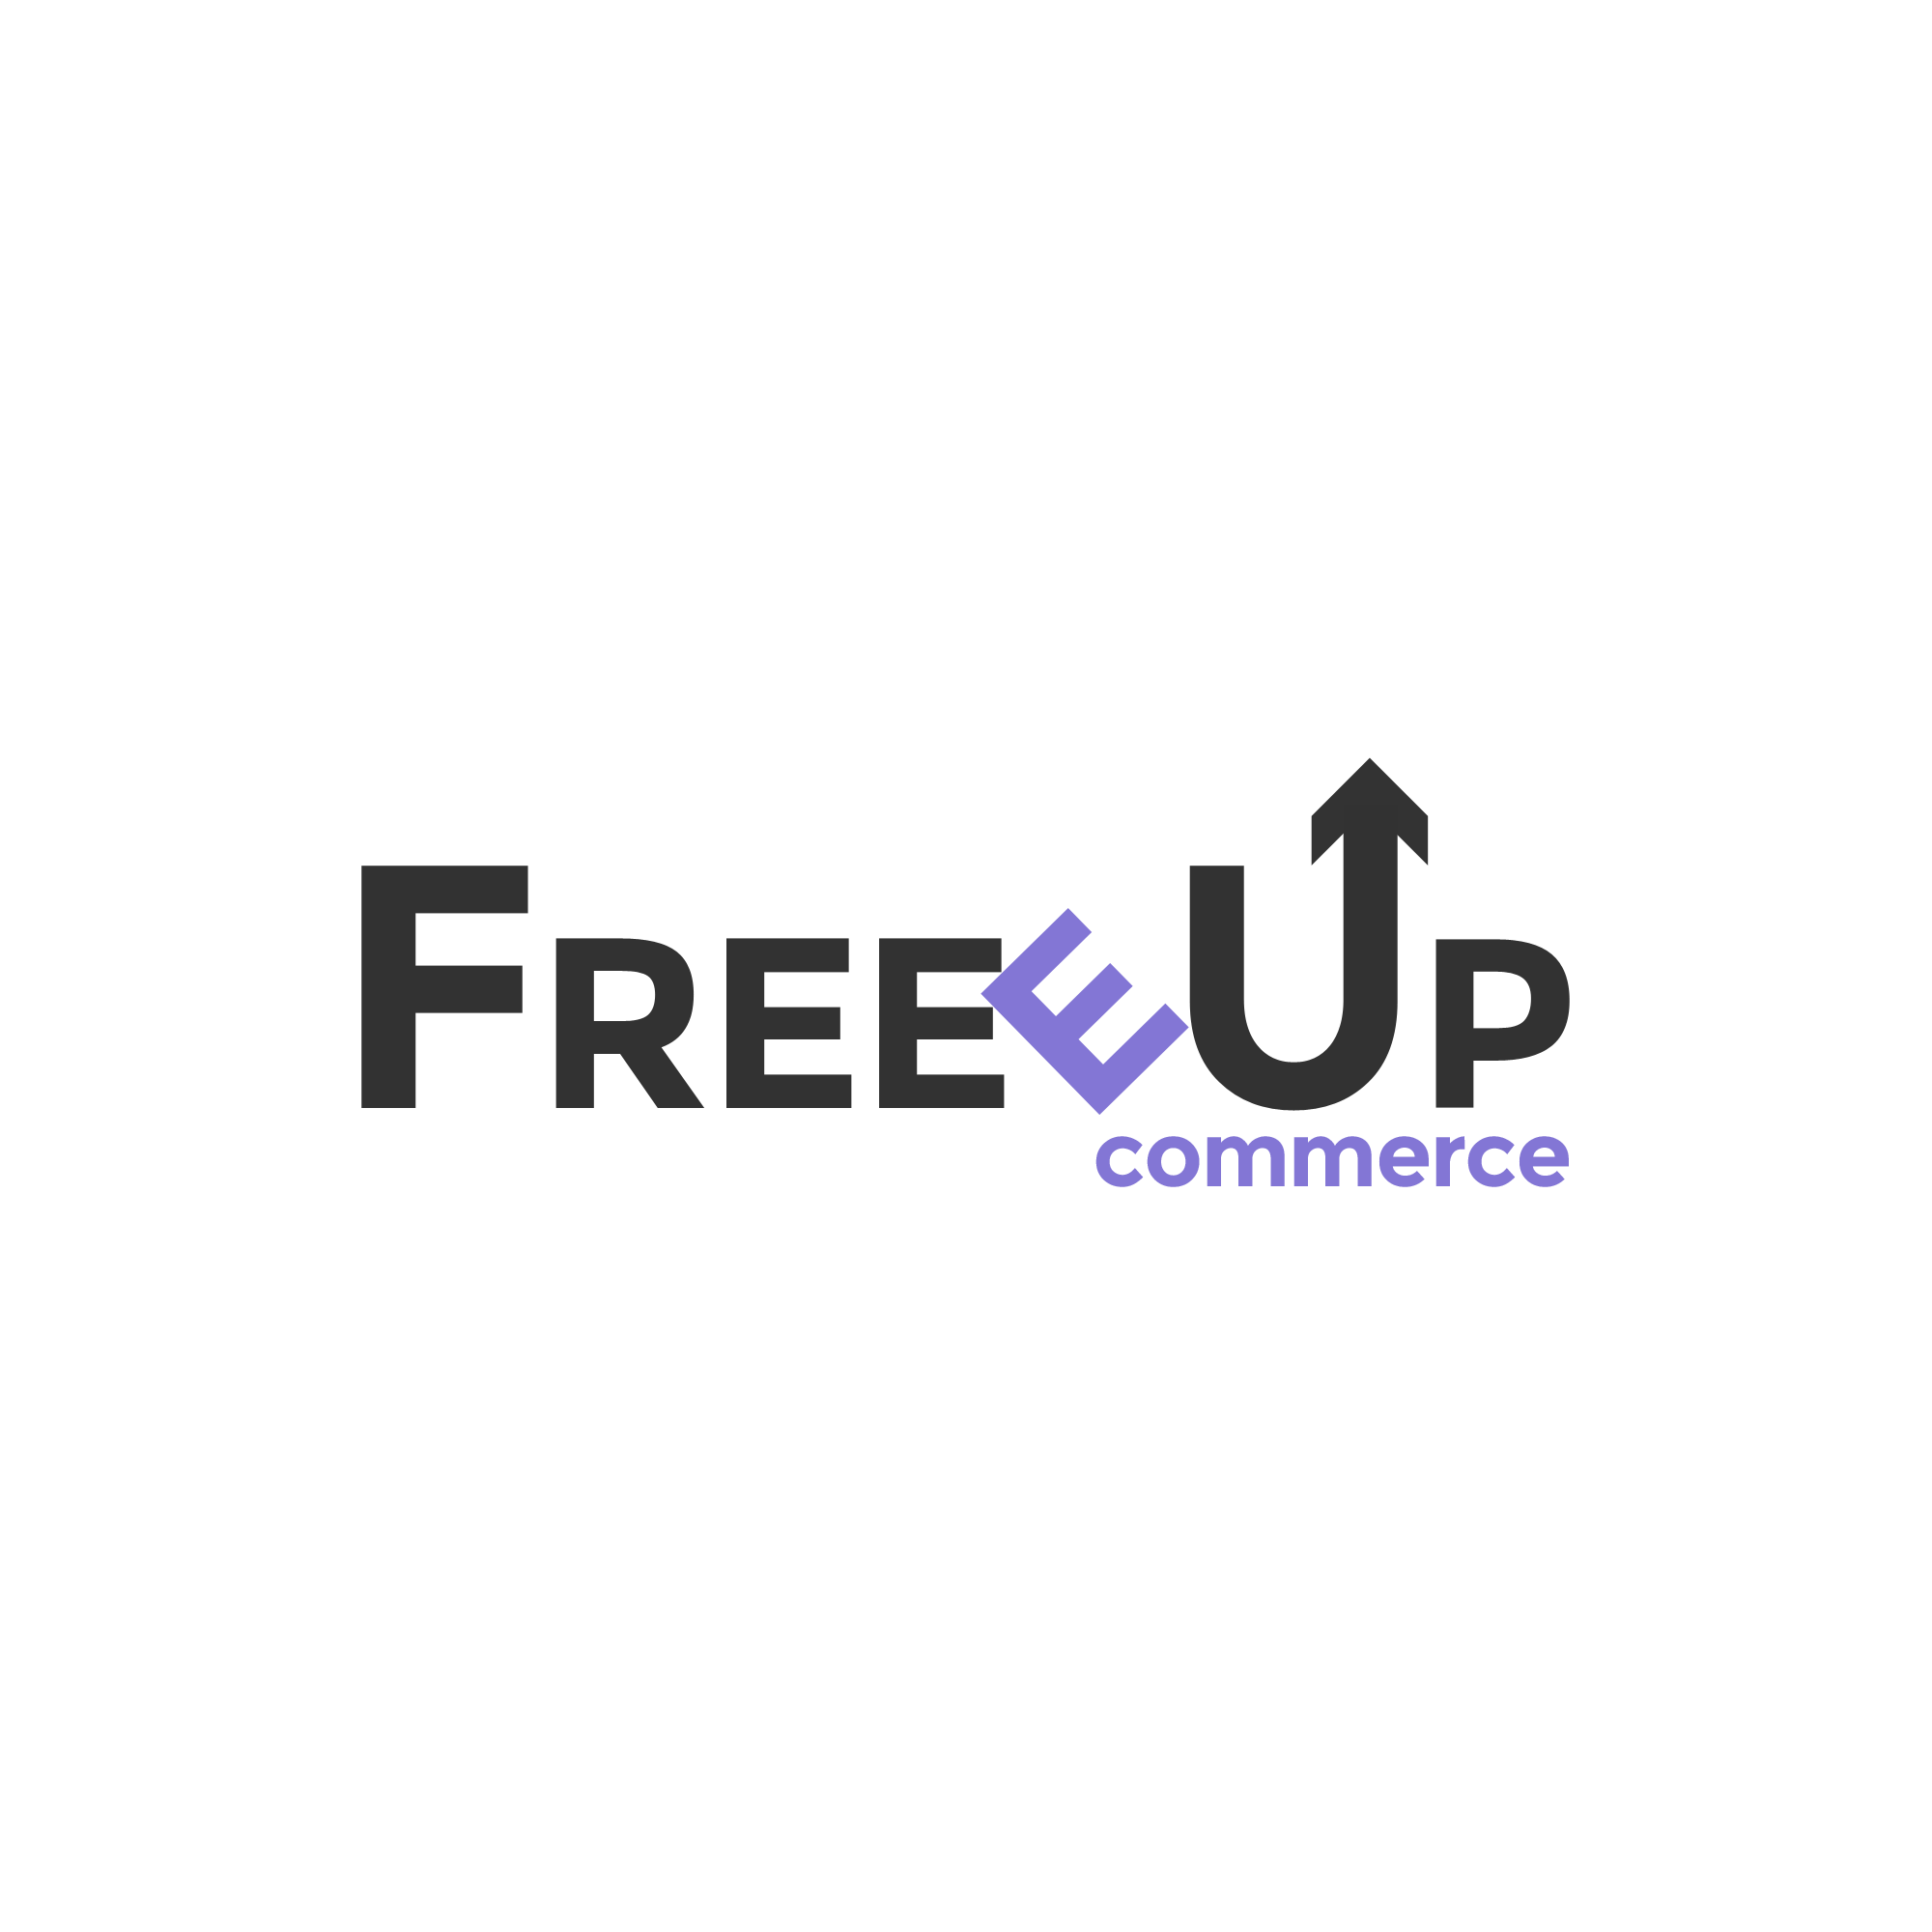 FreeeUp.com